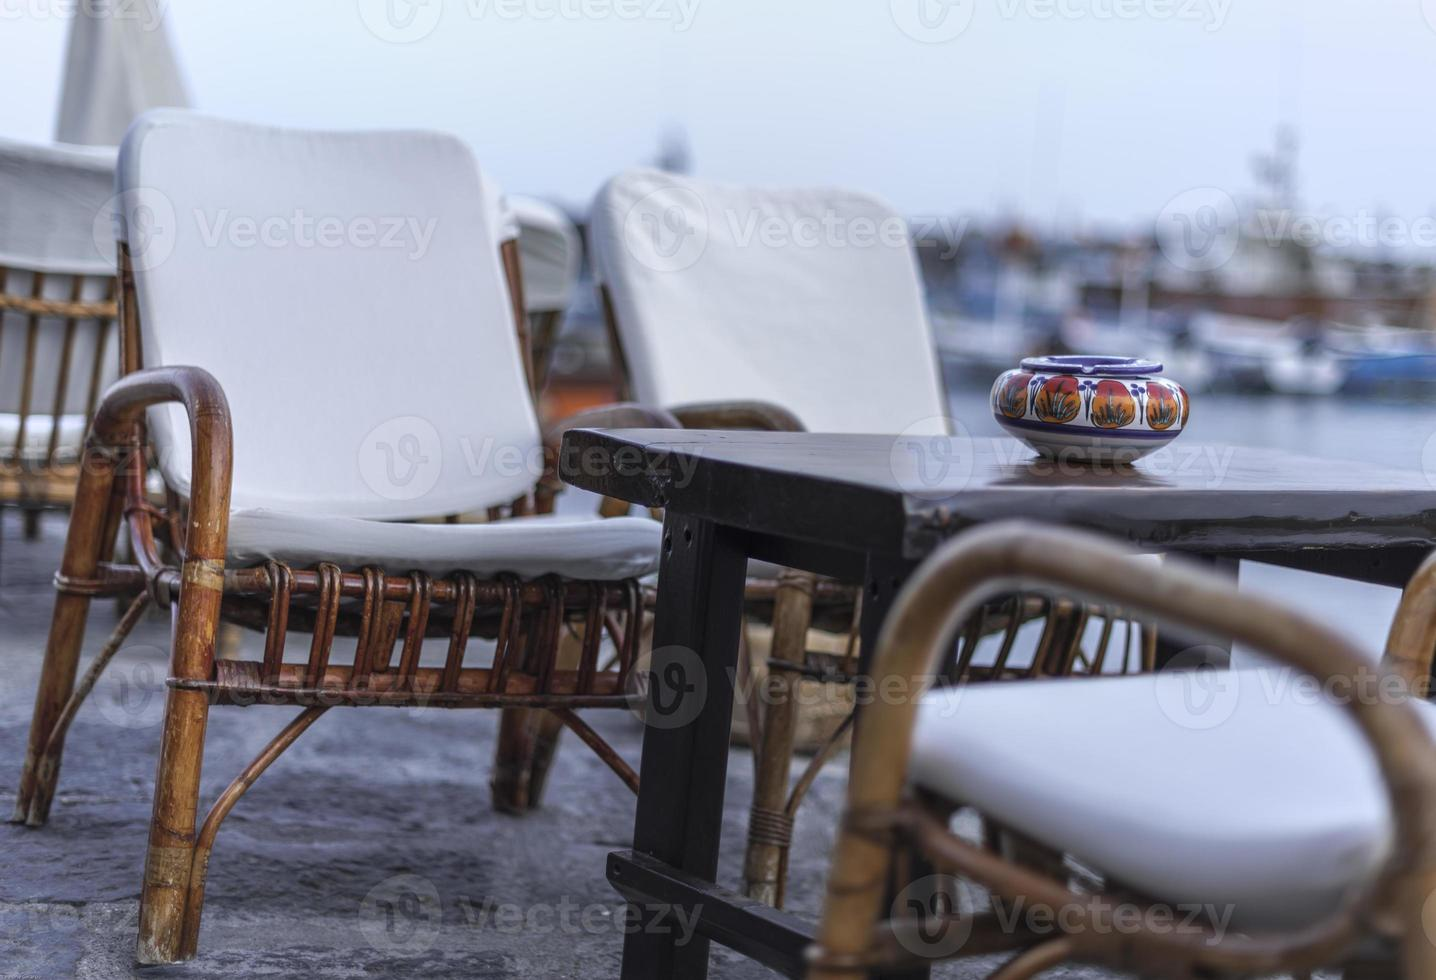 sant'angelo d'ischia, bar haven. italo ontspannen. mode foto